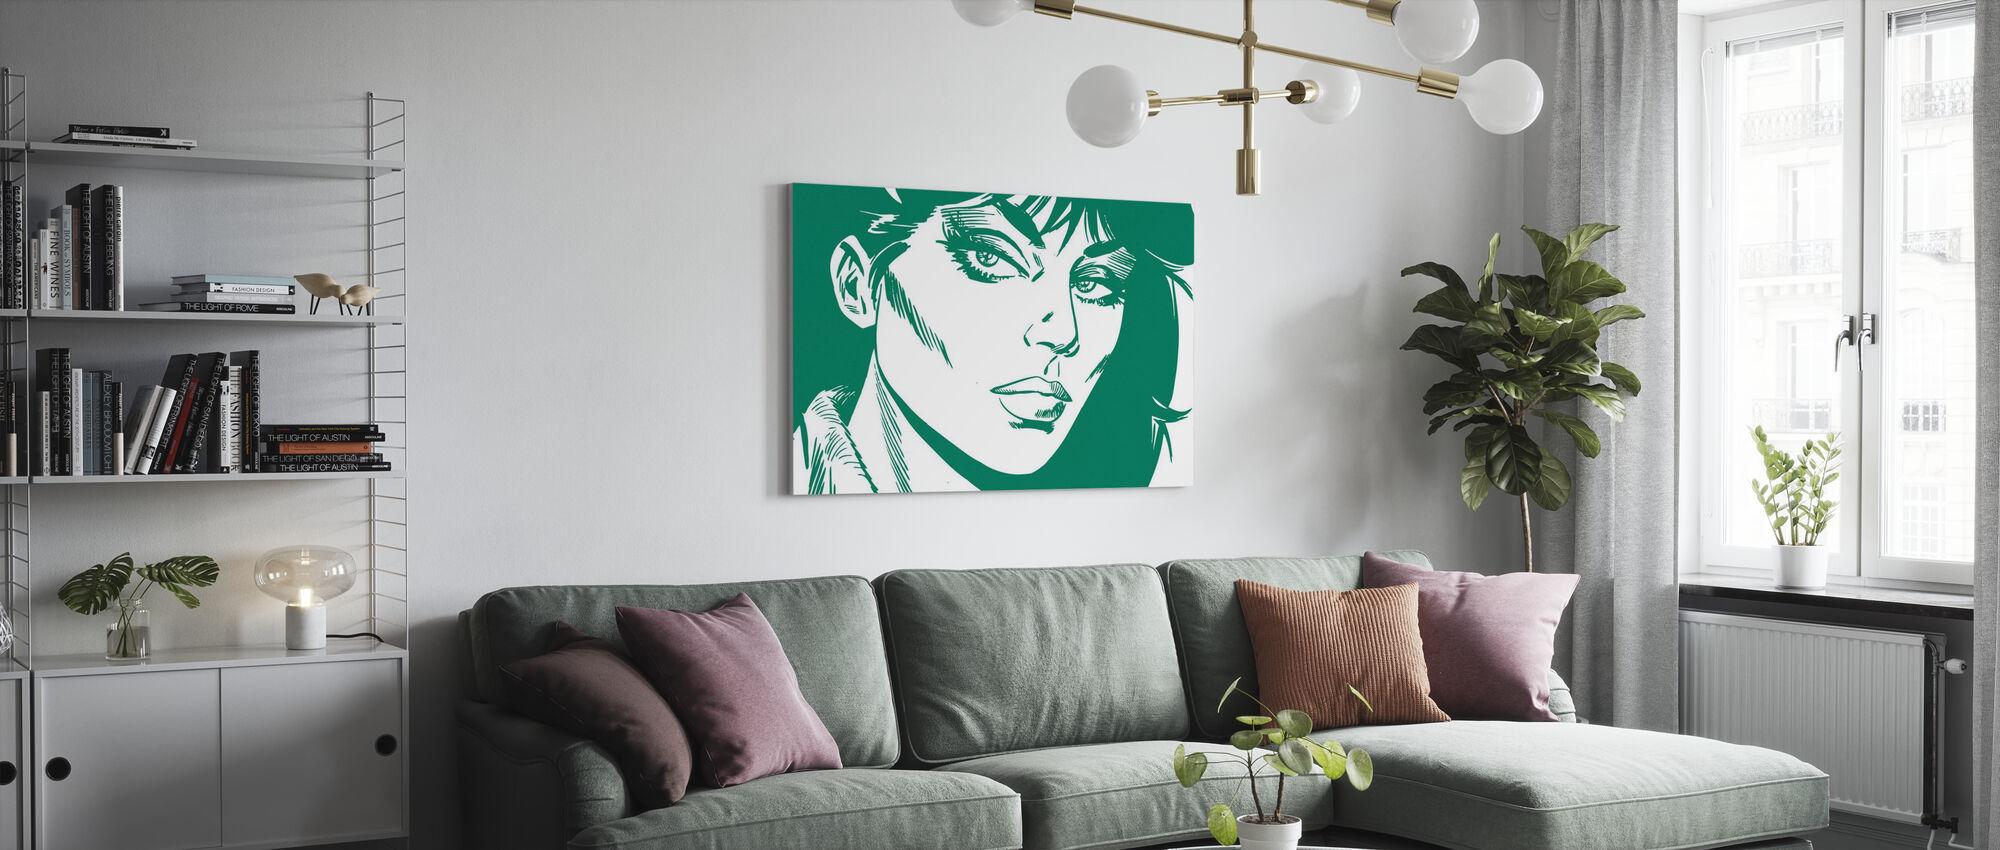 Modesty - Visage Vert - Impression sur toile - Salle à manger